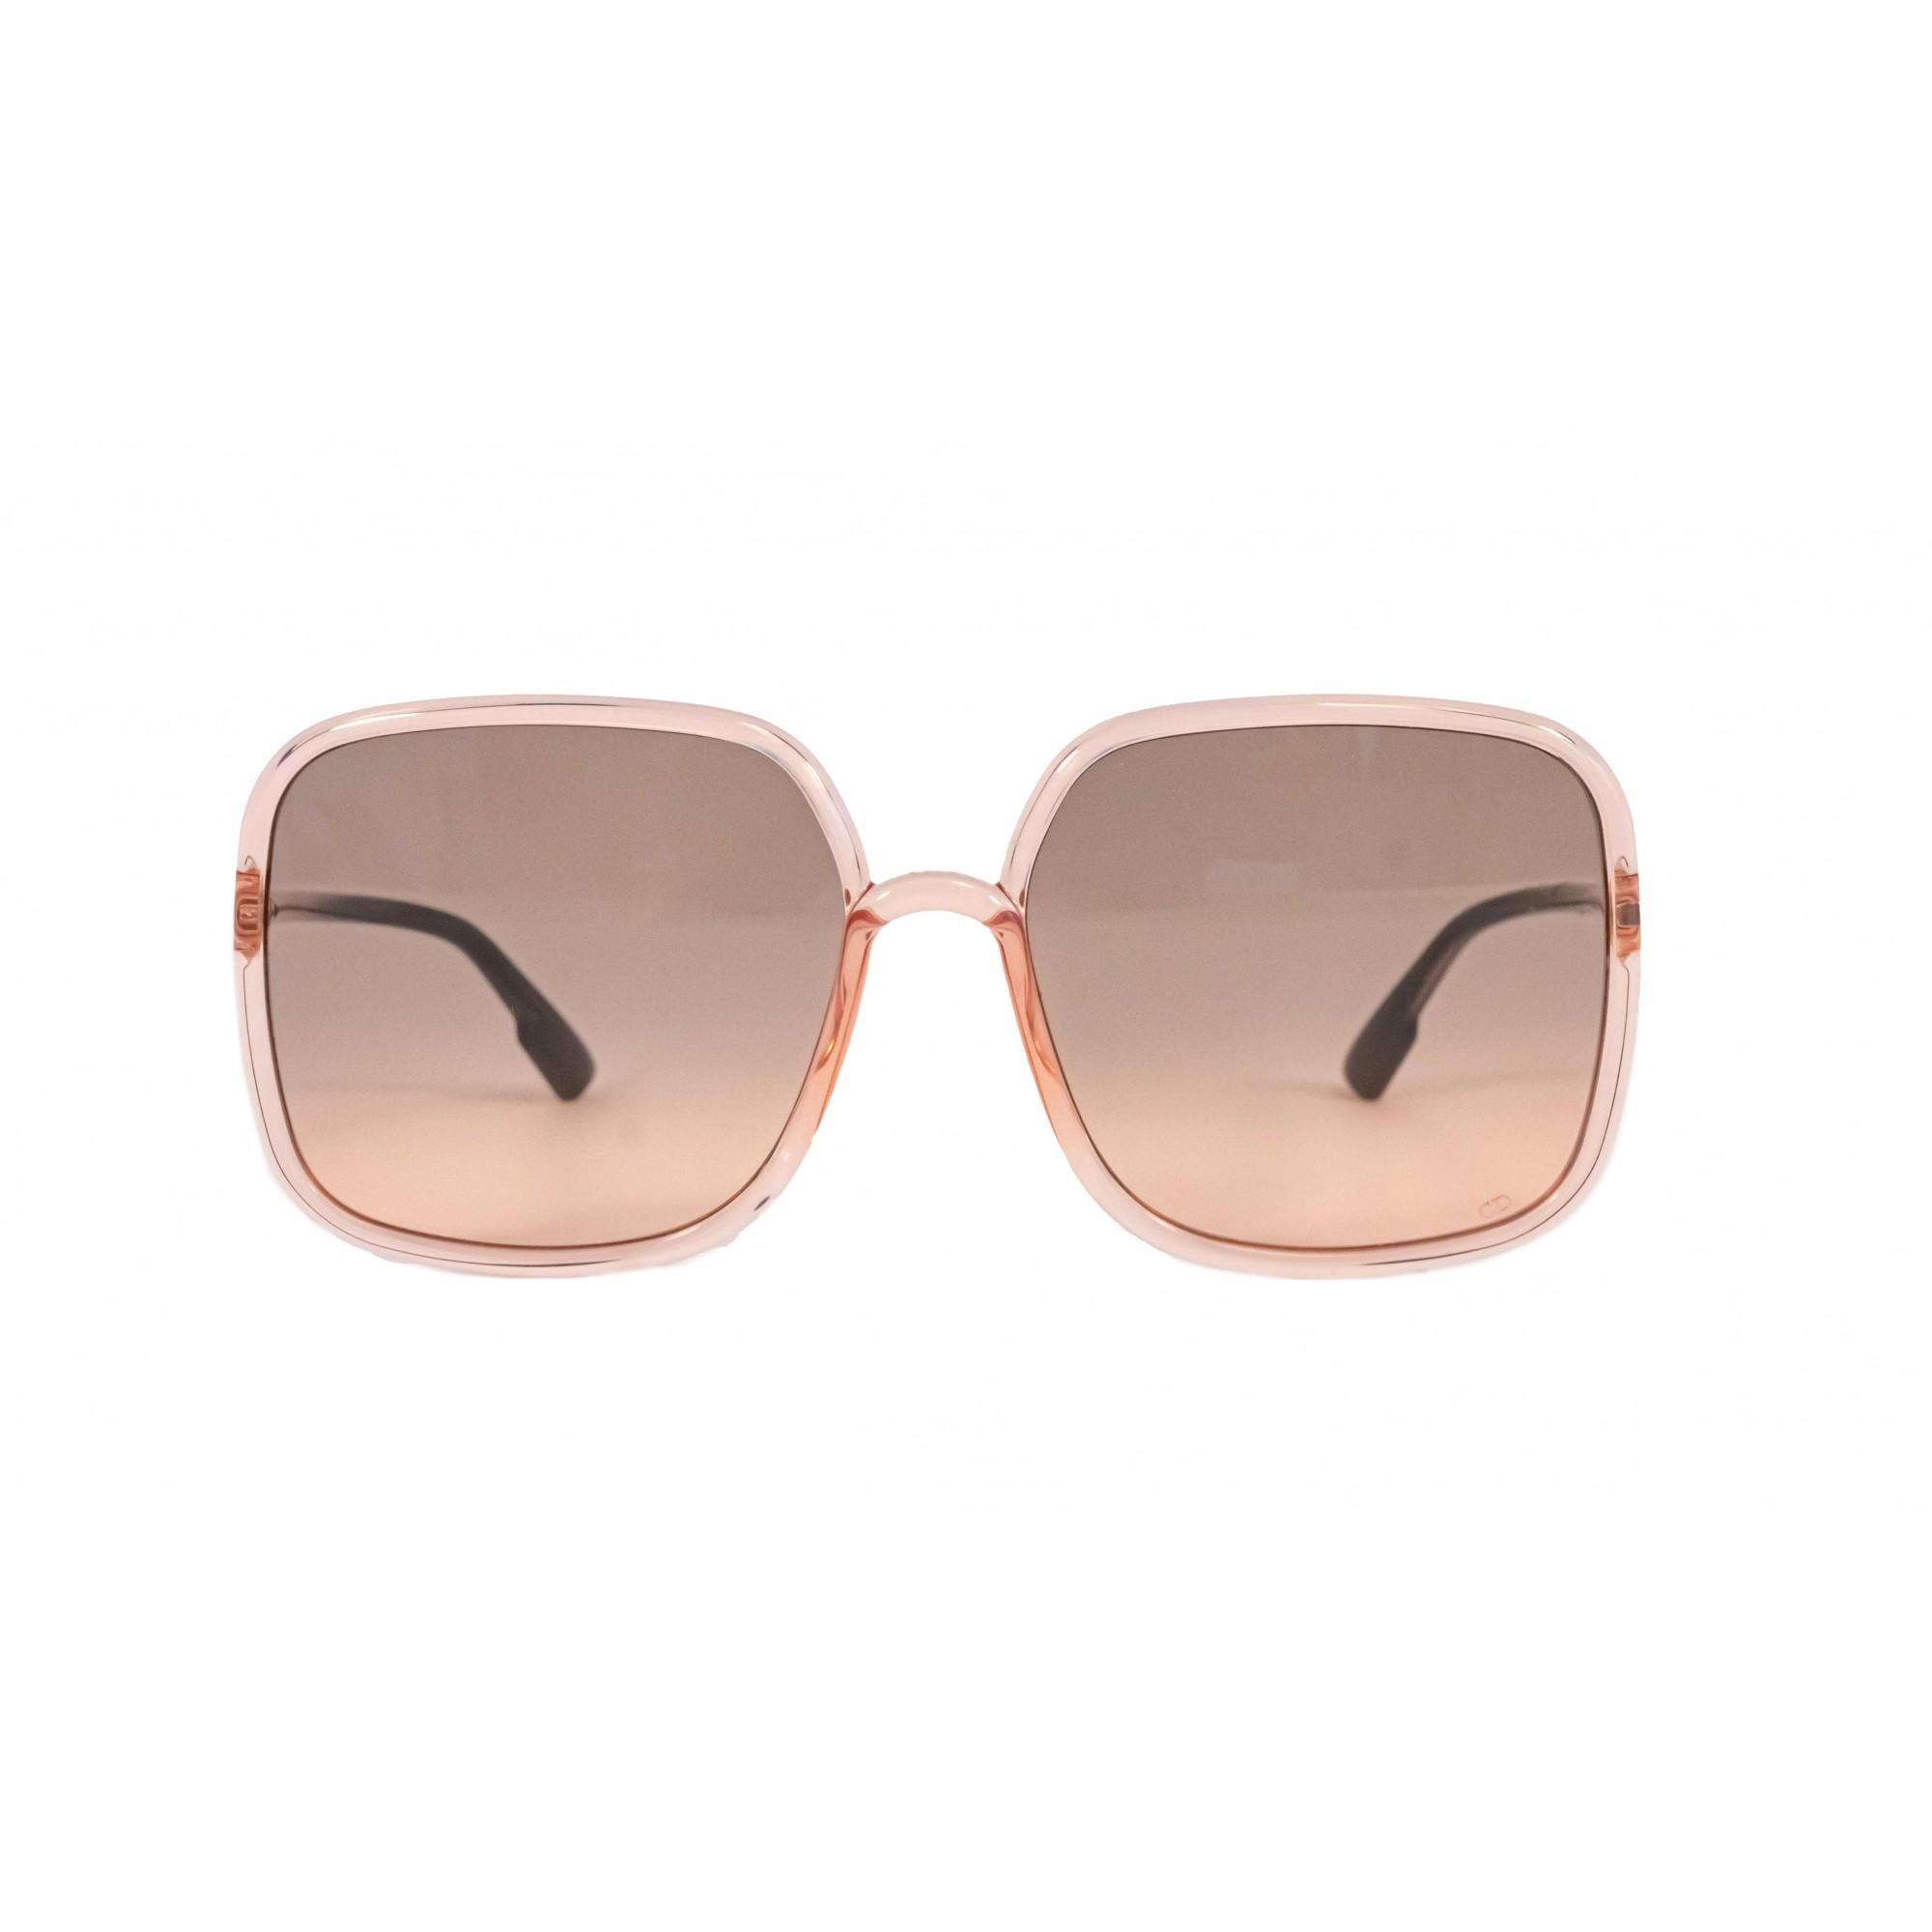 Óculos Dior Quadrado Stellaire1 1n5ff  59 Rosé